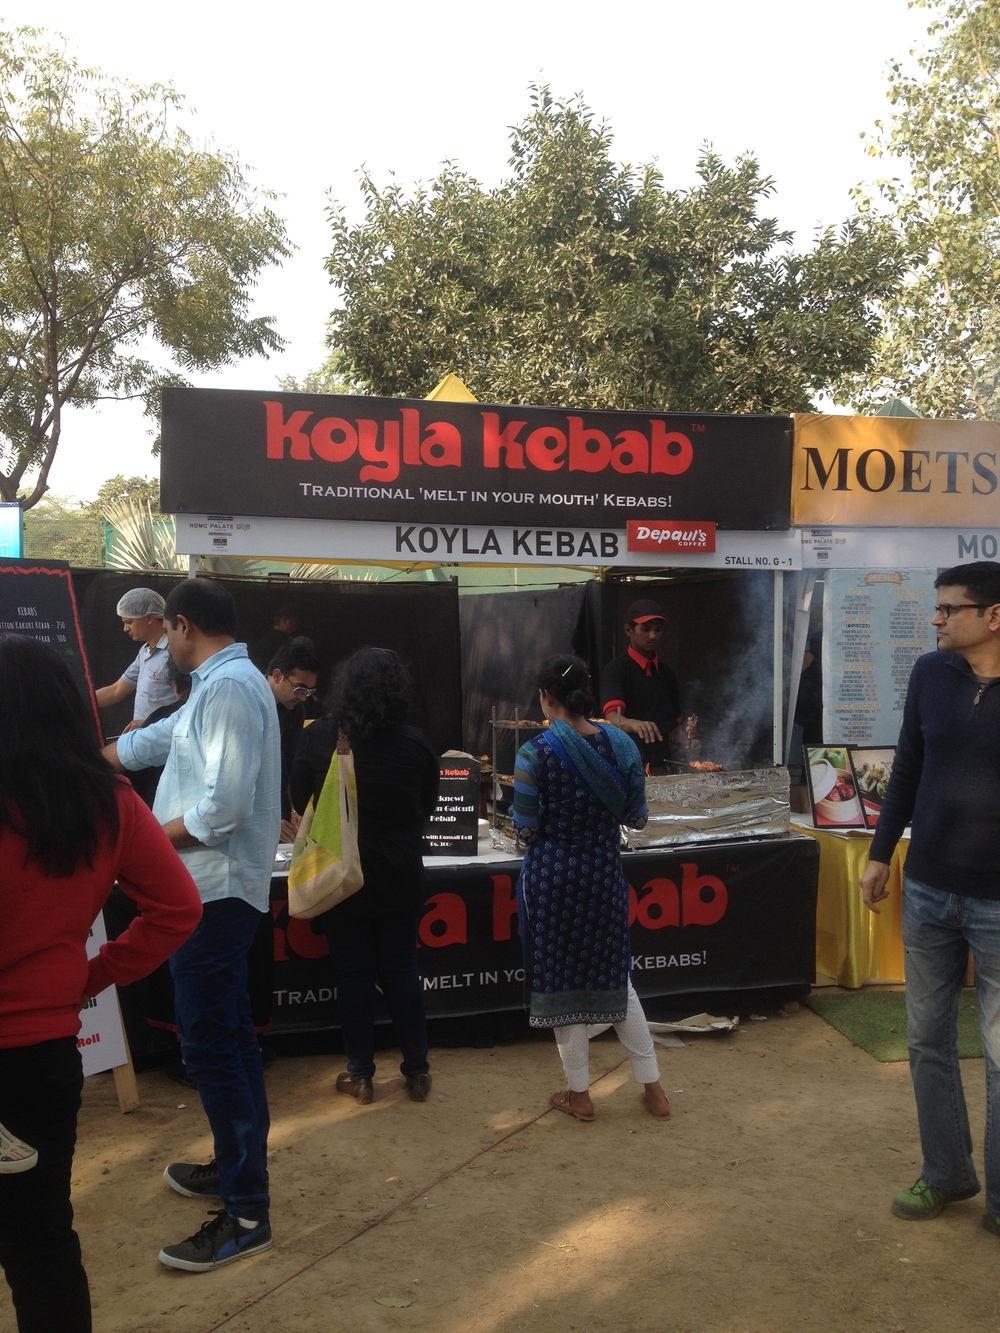 Koyla Kebabs churning out Kebab rolls like clock work